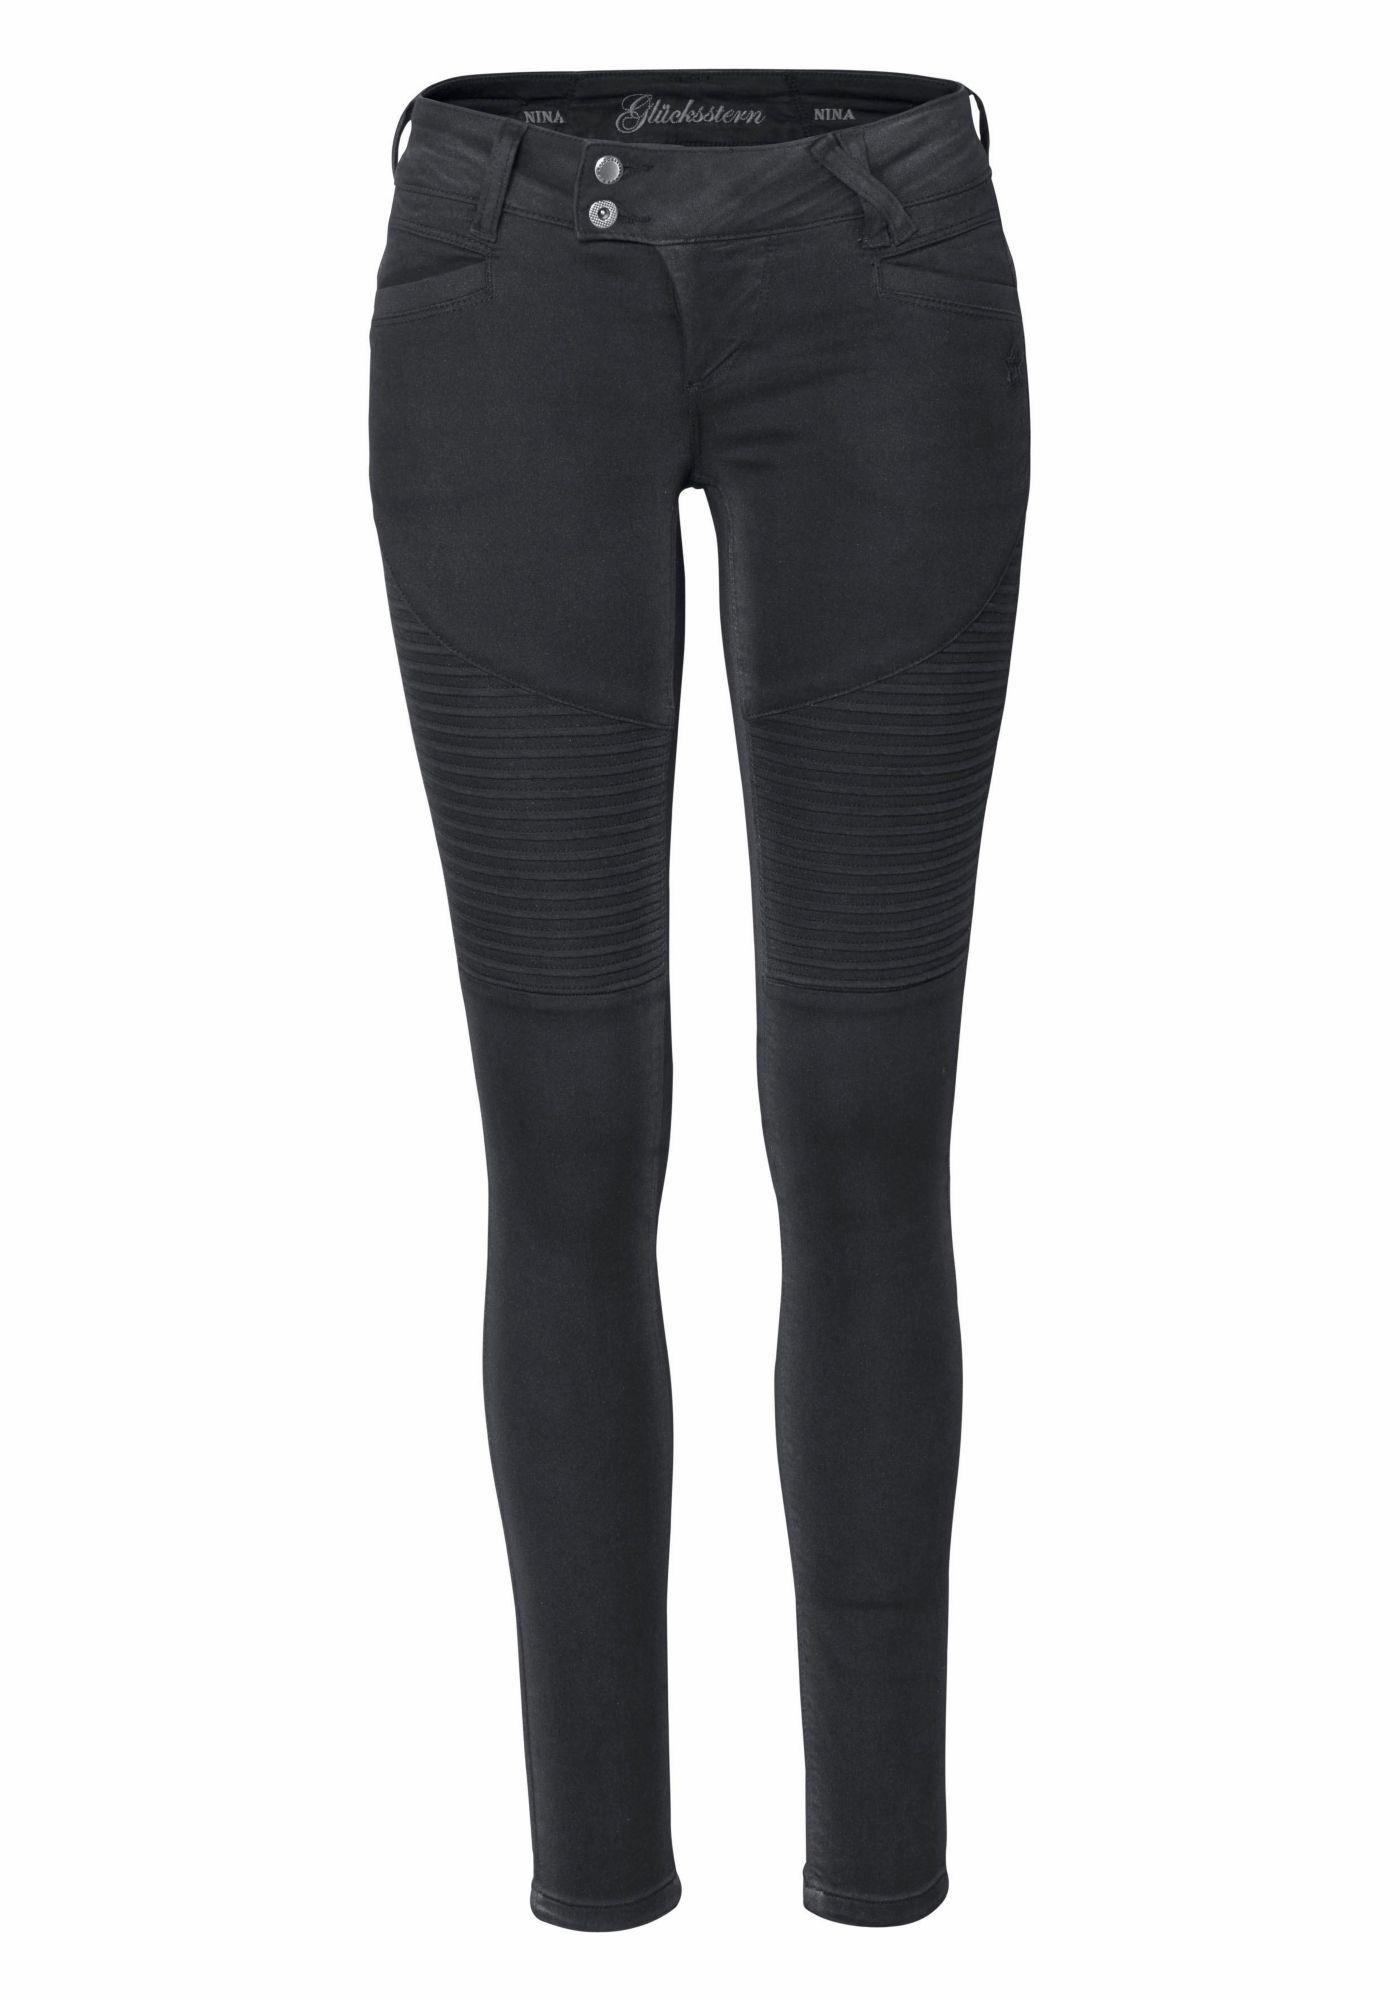 GLÜCKSSTERN Glücksstern Stretch-Jeans »Nina«